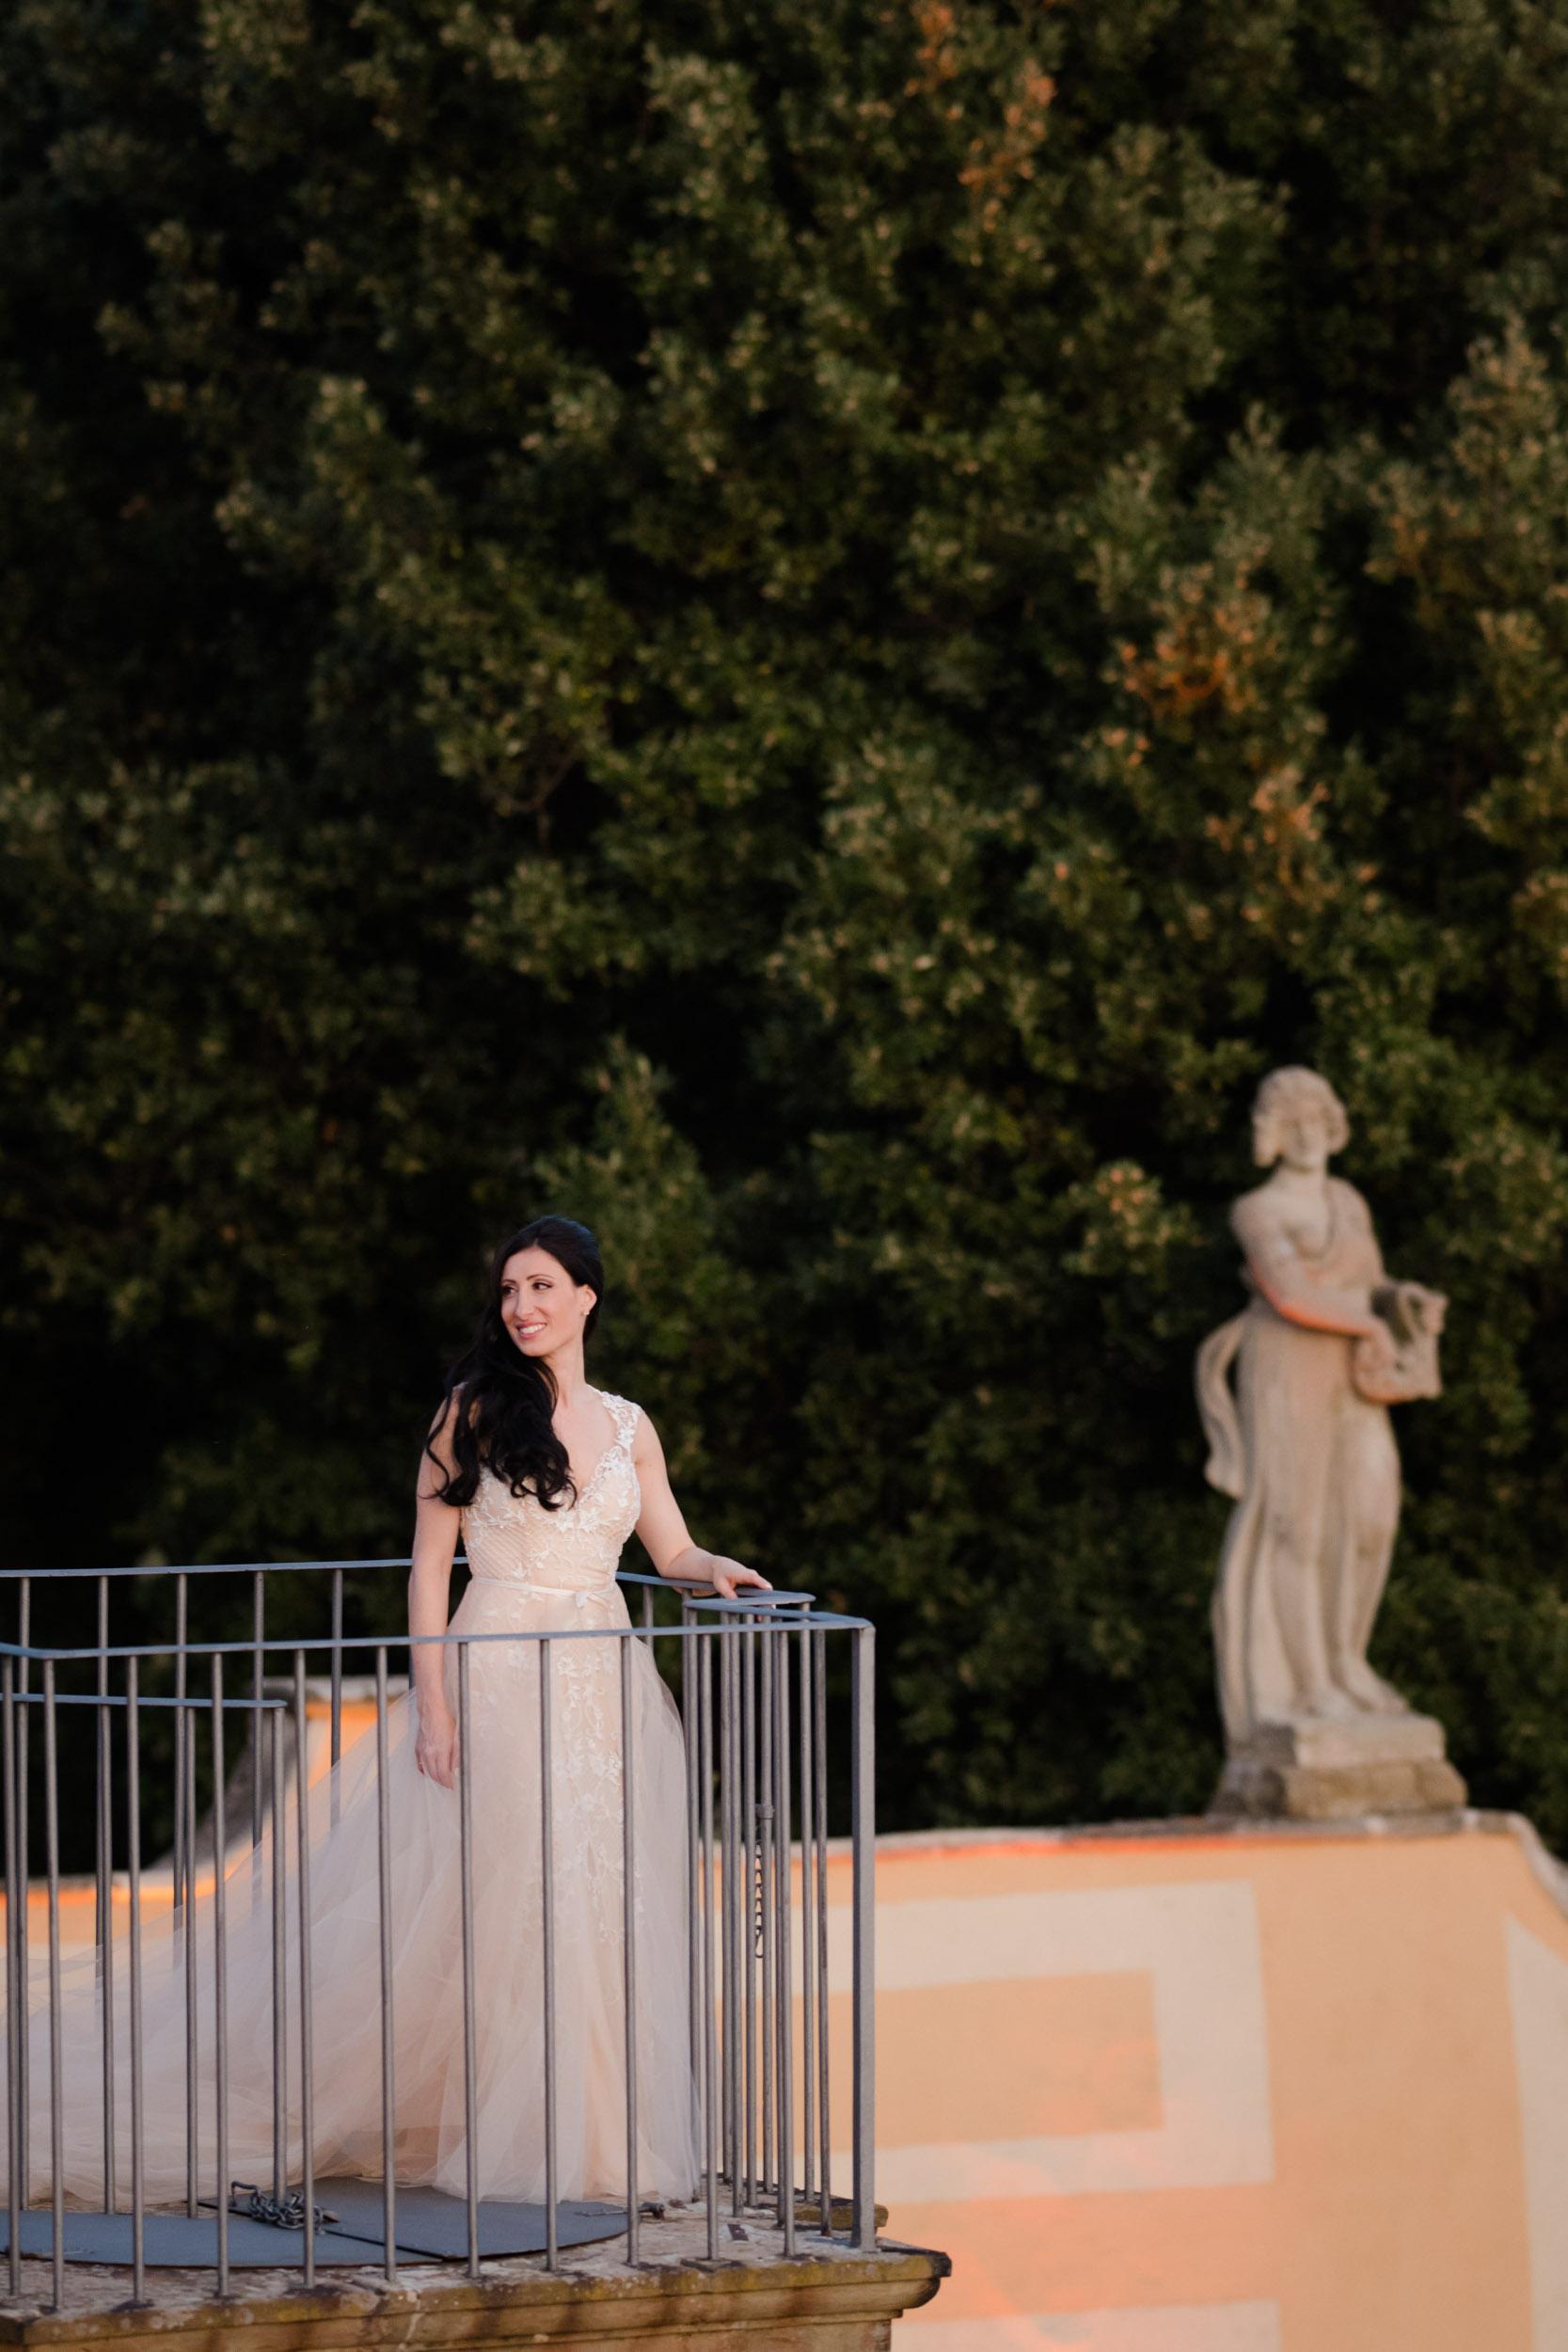 villa-gamberaia-florence-italy-destination-wedding-72.jpg